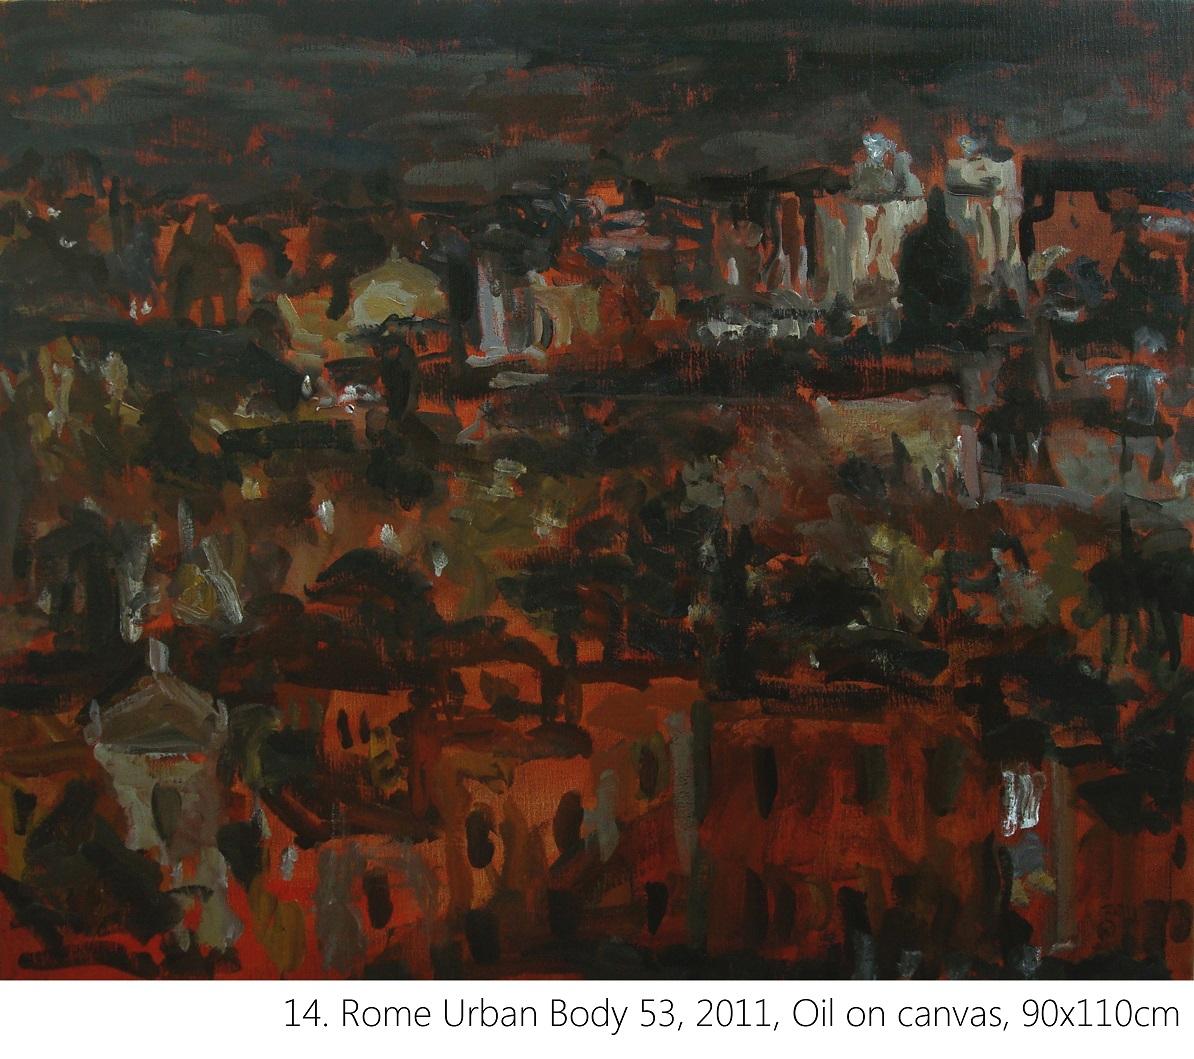 14. Rome Urban Body 53, 2011, Oil on canvas, 90x110cm